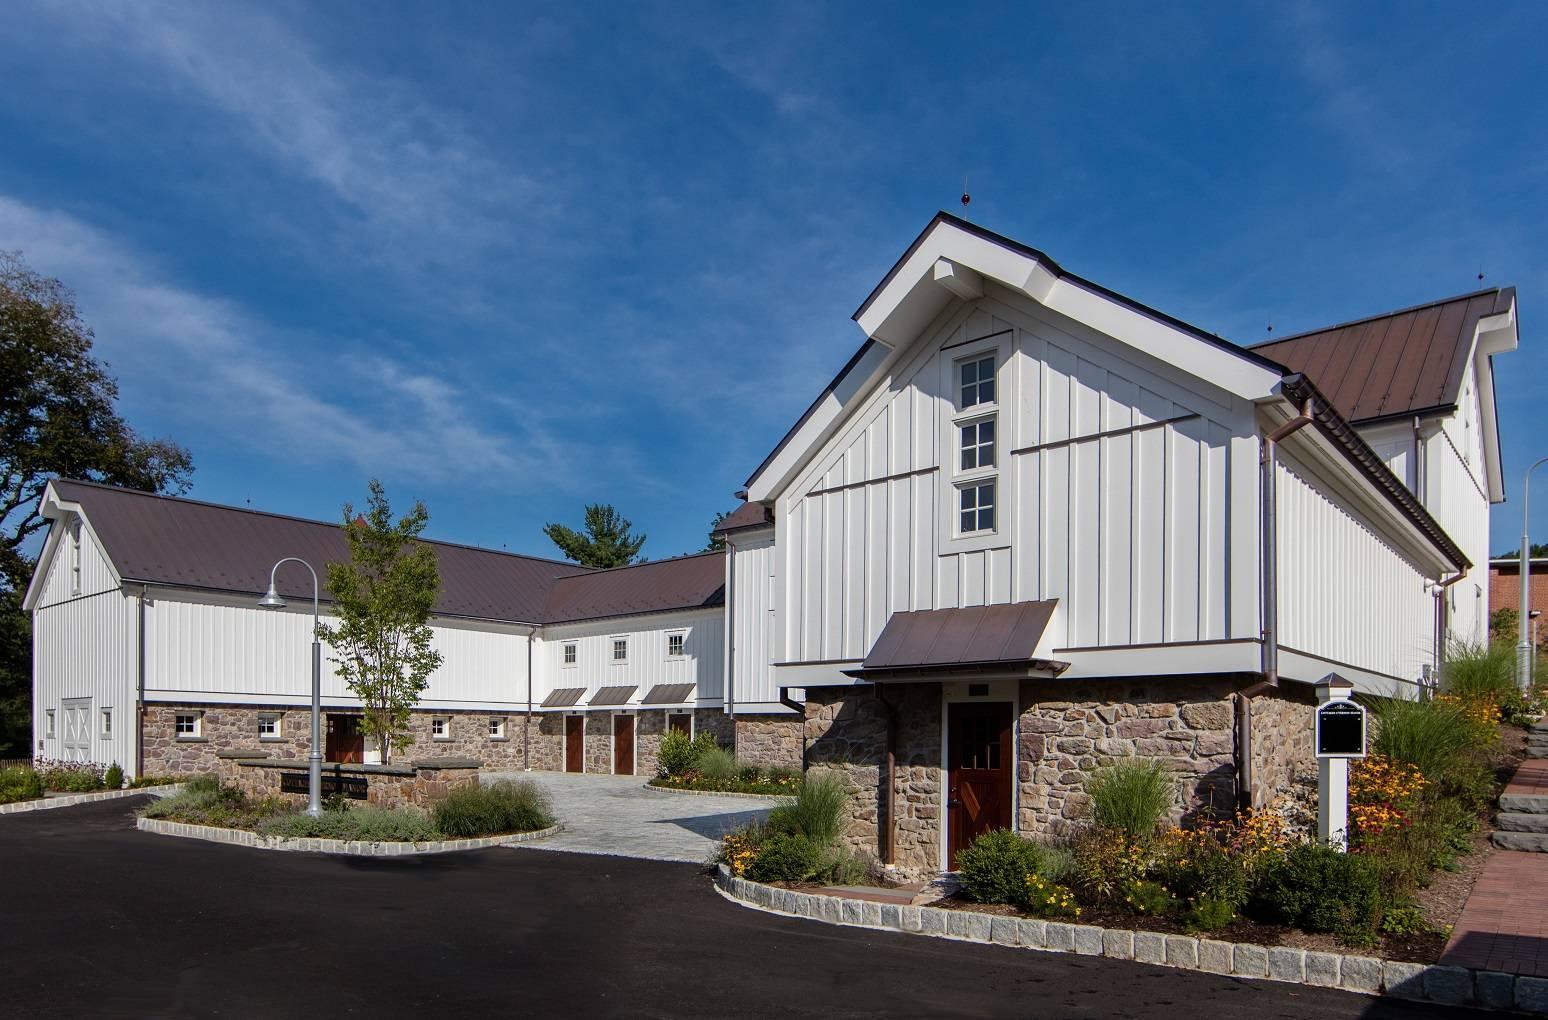 Twin Borough 39 S Barn At Vernon Manor Wins County Planning